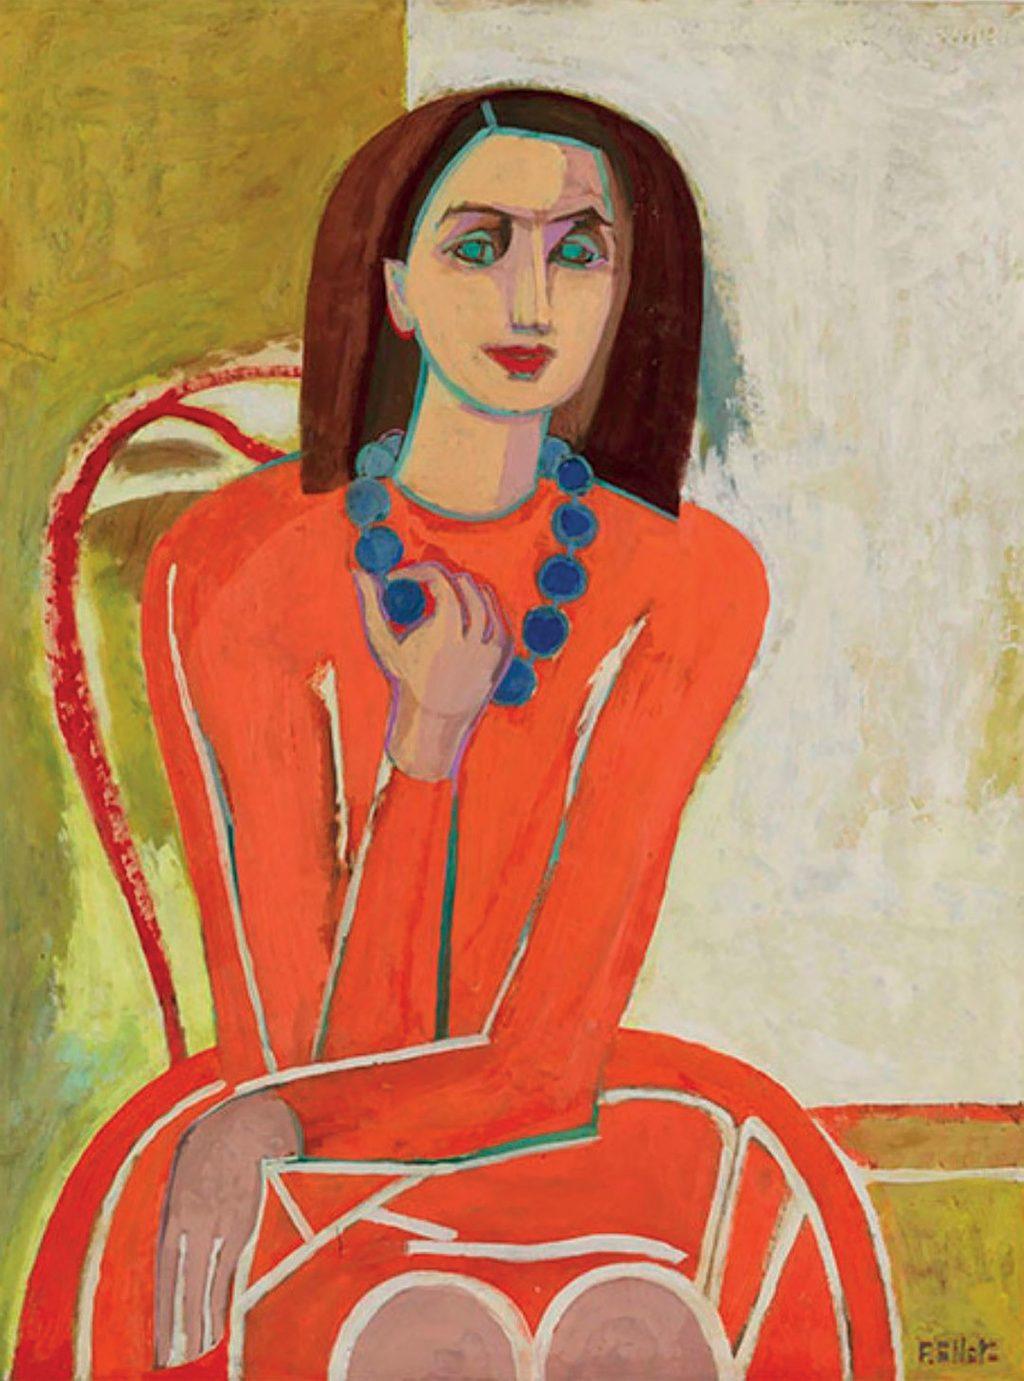 "Tác phẩm ""Study for a Self-Portrait của danh họa Françoise Gilot (1944-1945)."